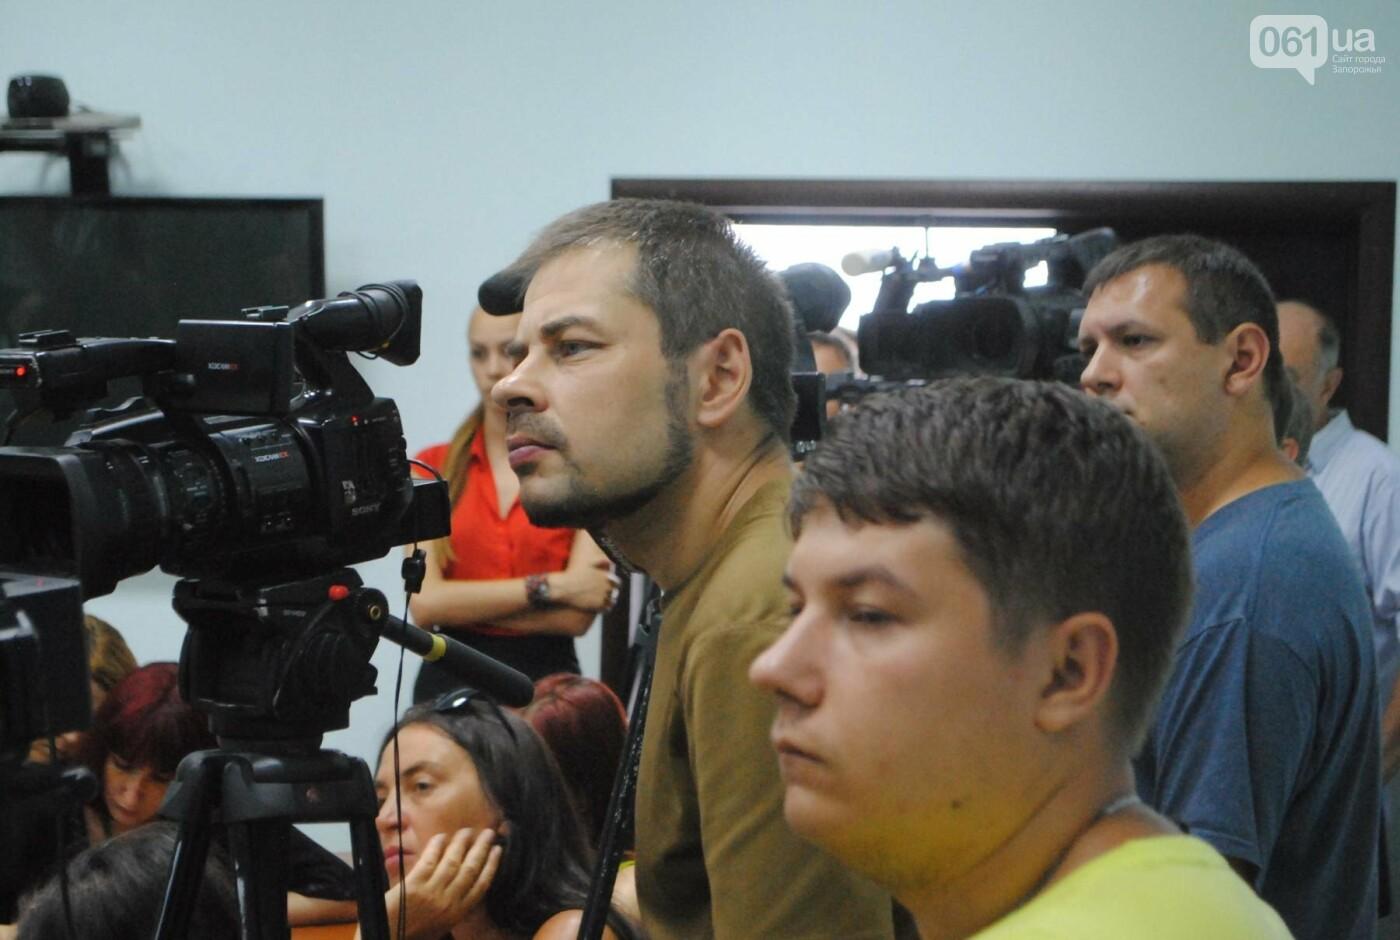 За Олешко следили два дня: в полиции рассказали подробности покушения в Бердянске, - ФОТО, фото-3